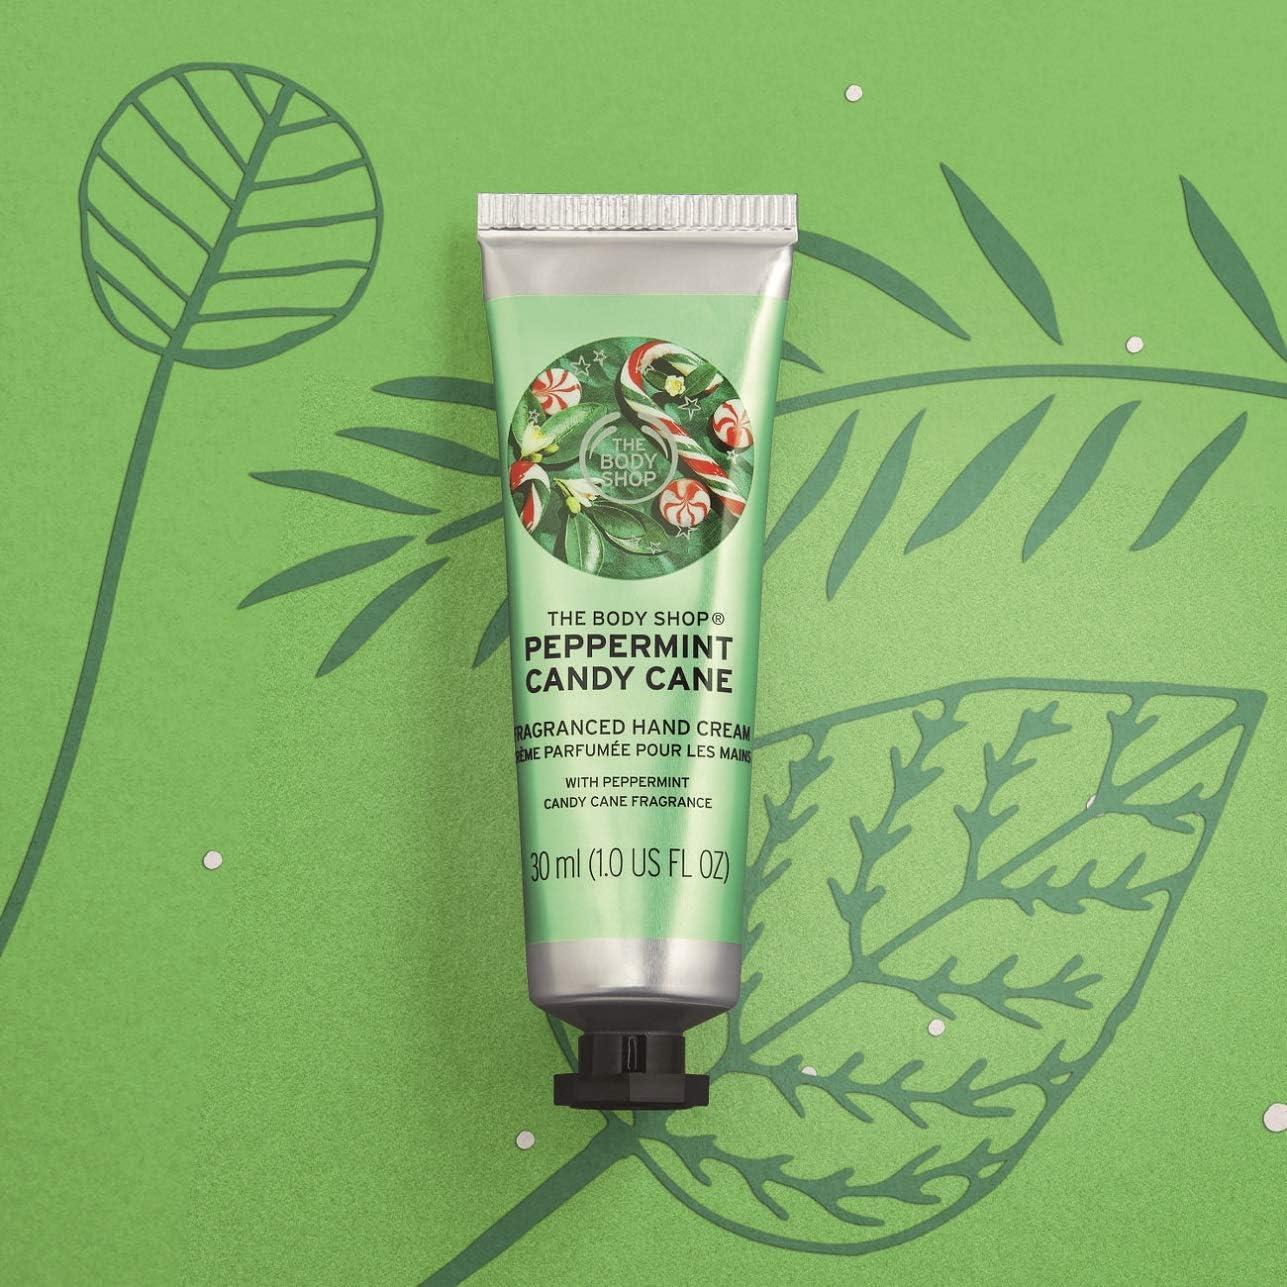 The Body Shop Peppermint Candy Cane Hand Cream, 1 Fl Oz